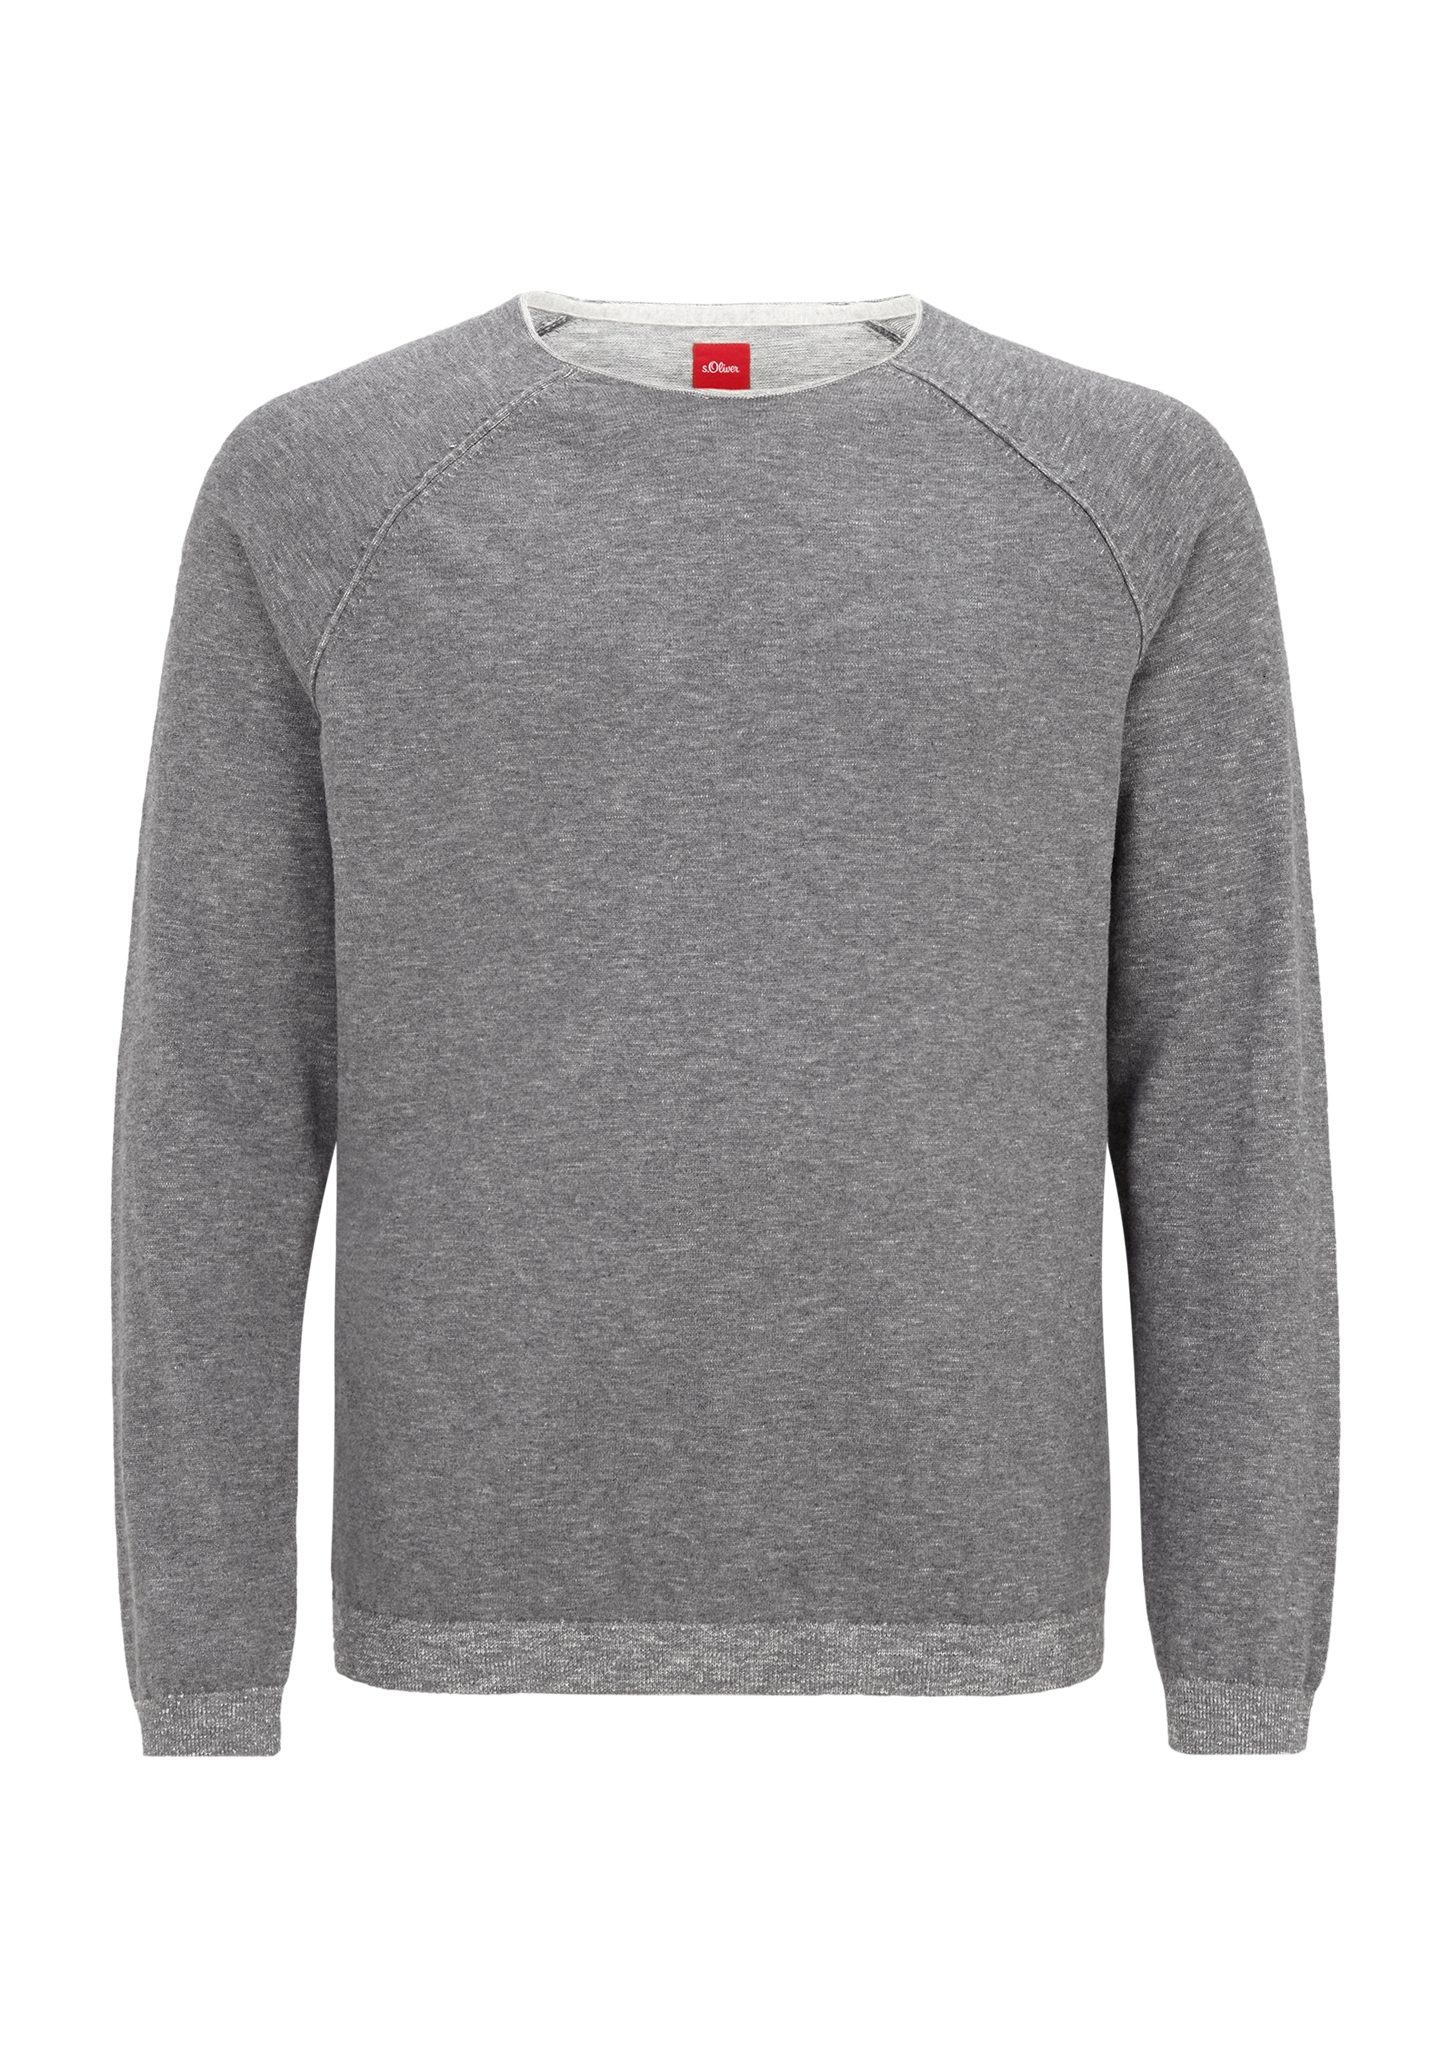 Pullover   Bekleidung > Pullover > Sonstige Pullover   Grau/schwarz   100% baumwolle   s.Oliver Men Big Sizes